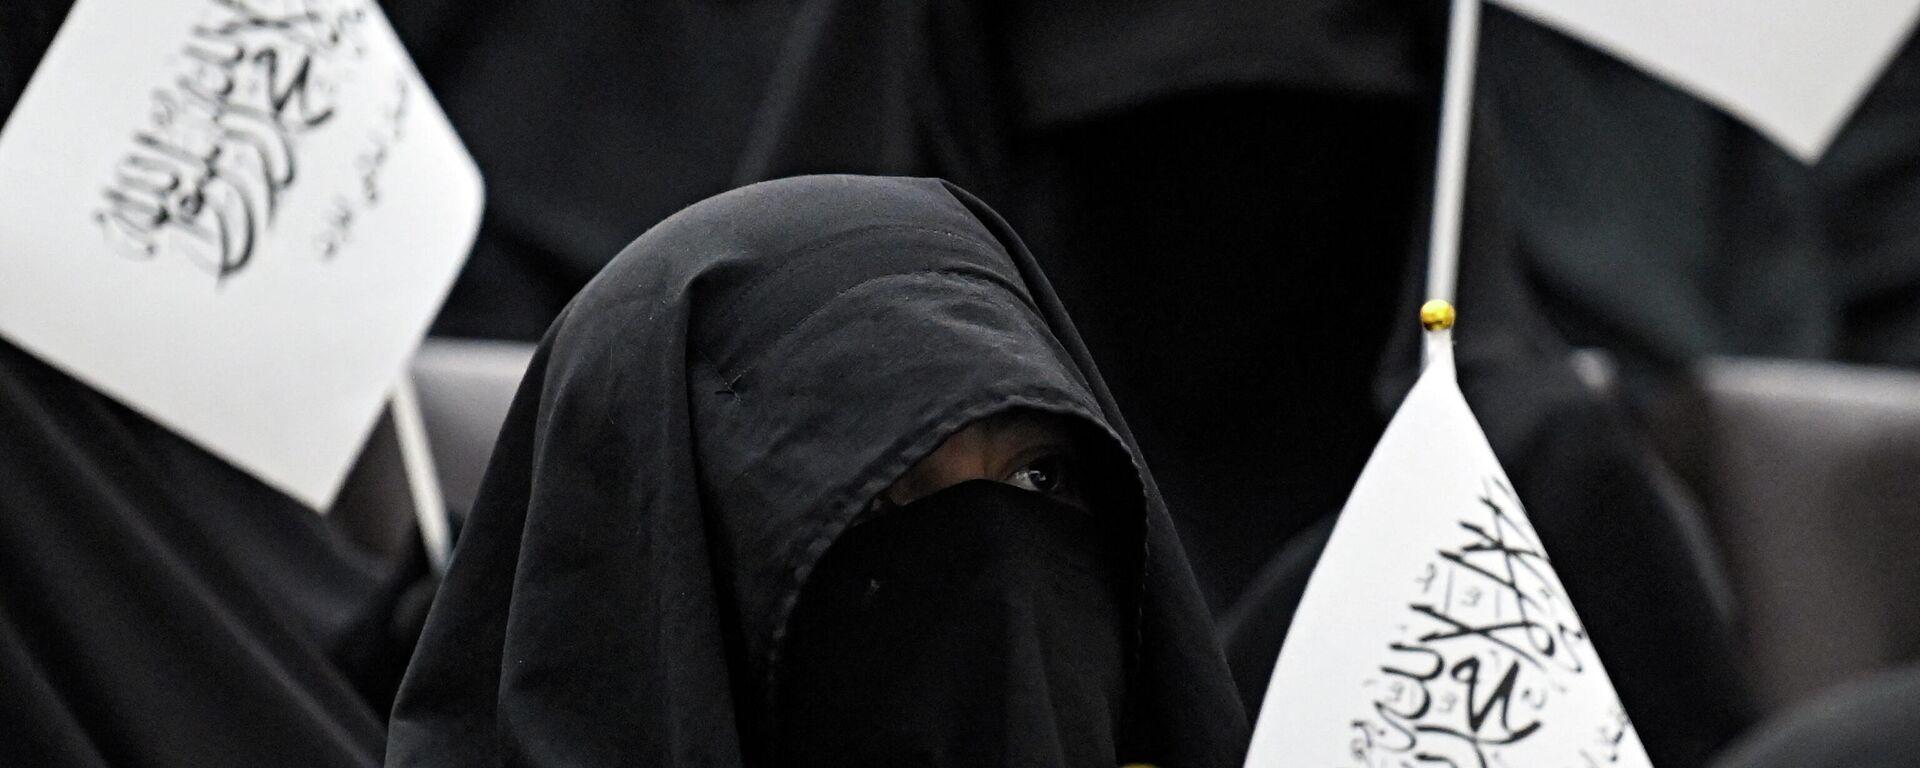 Frauen in Afghanistan mit Taliban-Flaggen  - SNA, 1920, 20.09.2021